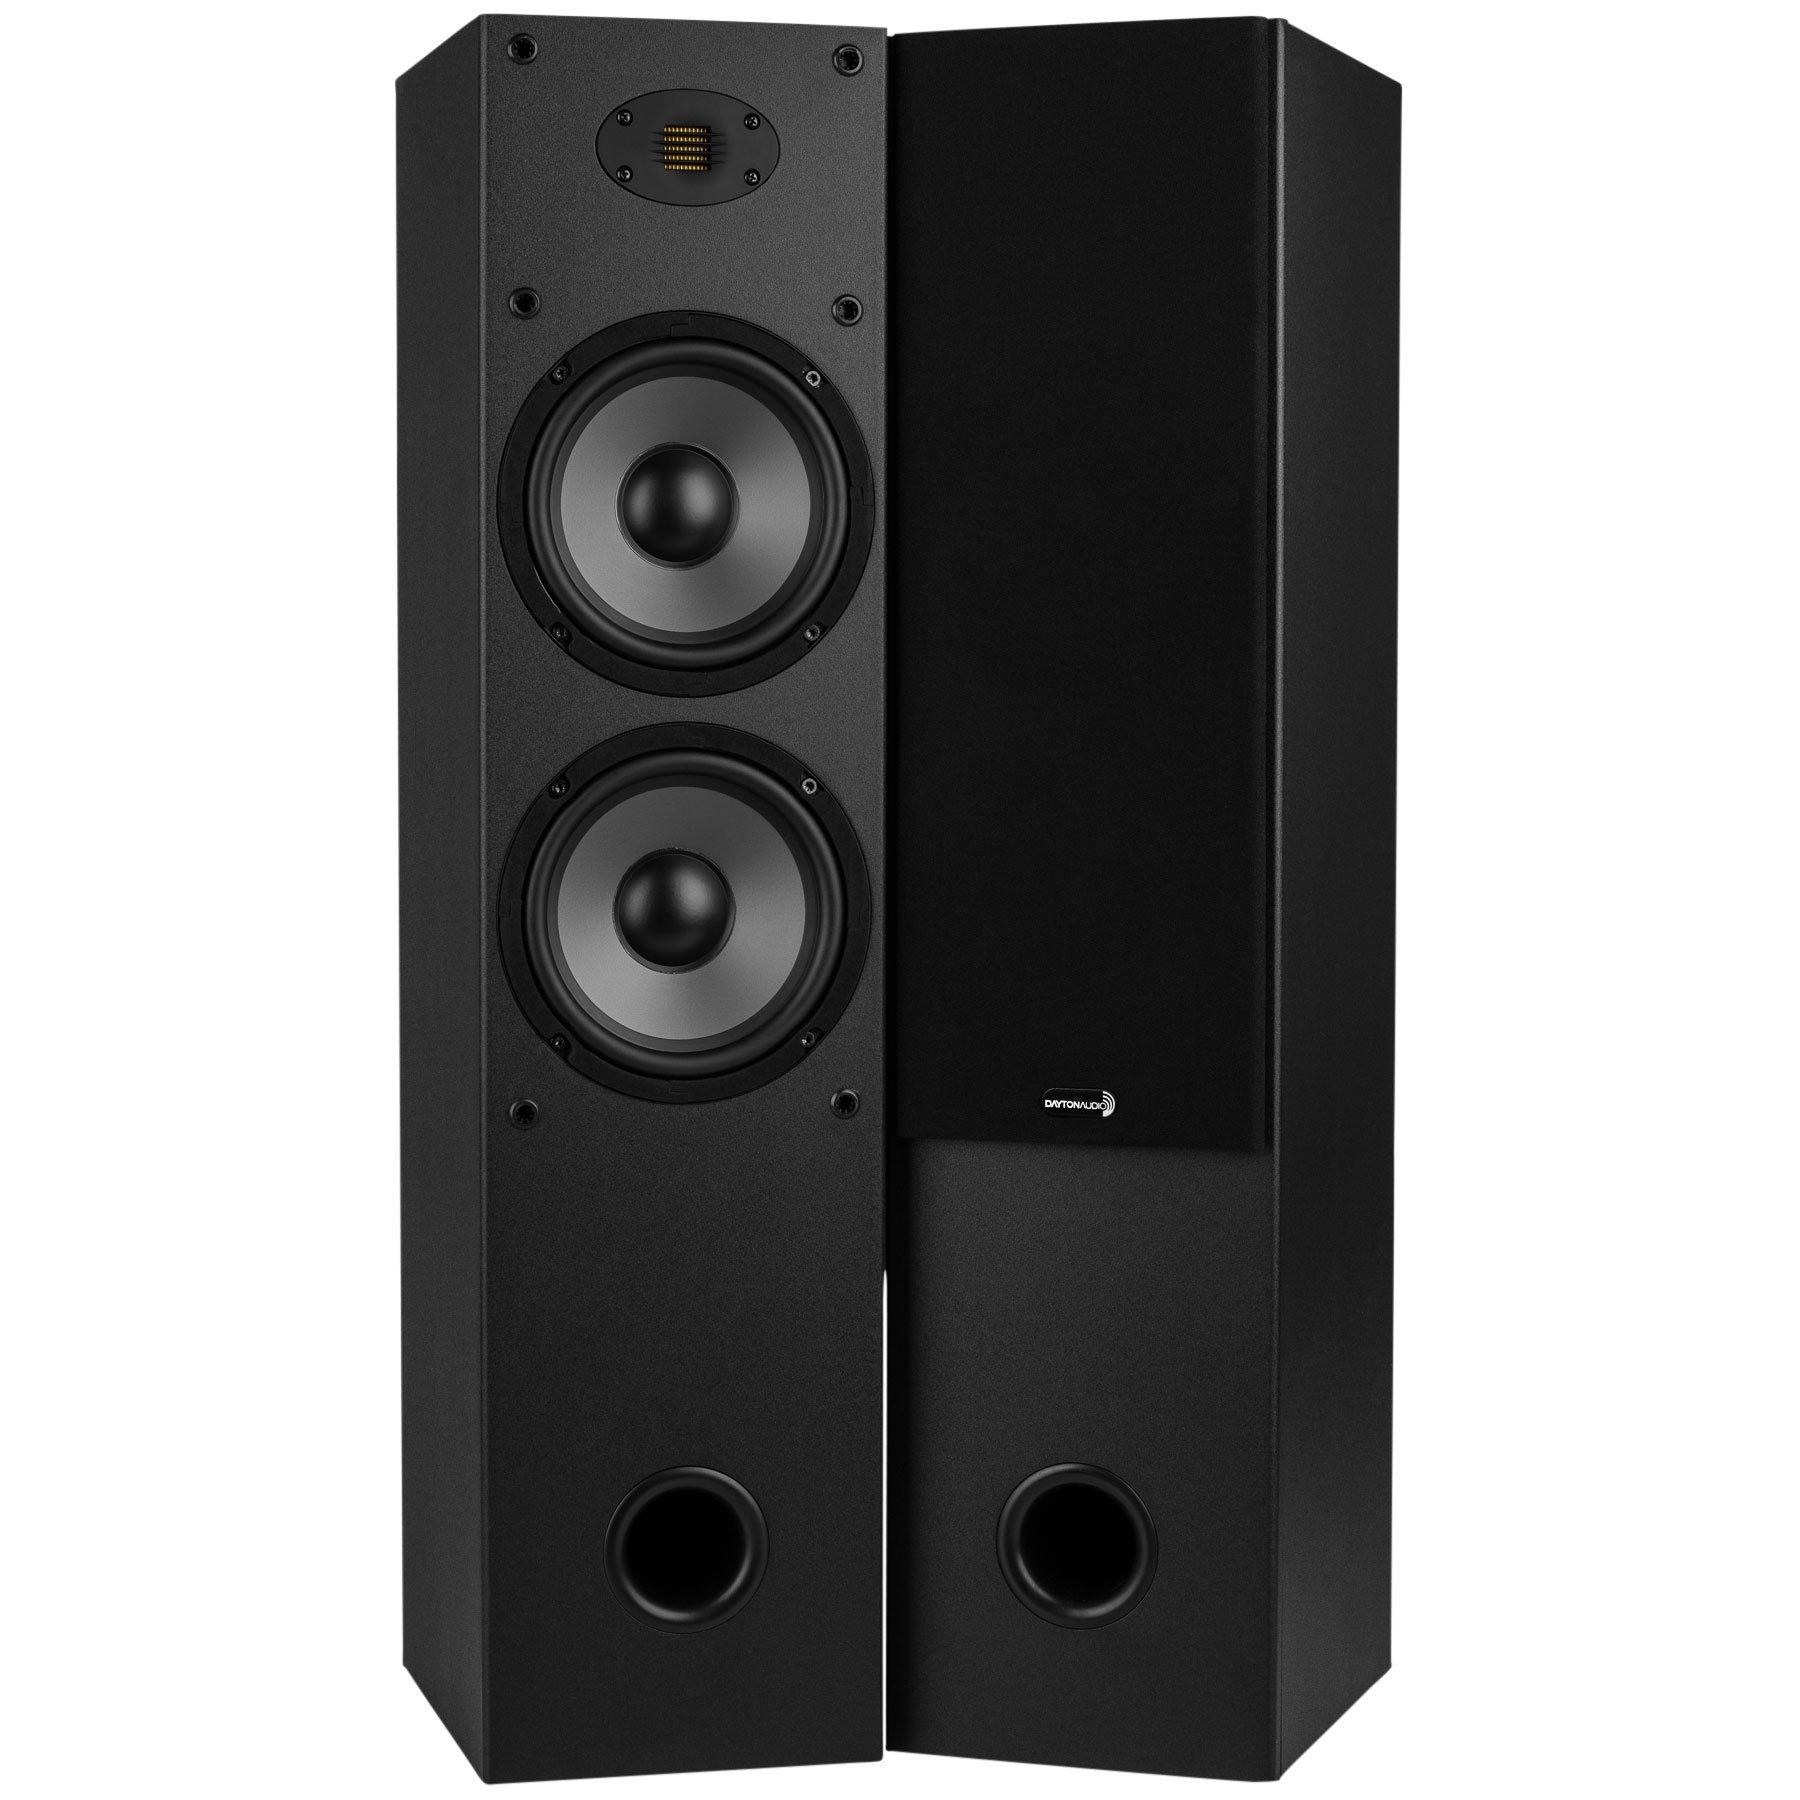 Dayton Audio T652-AIR Dual 6-1/2'' 2-Way Tower Speaker Pair with AMT Tweeter by Dayton Audio